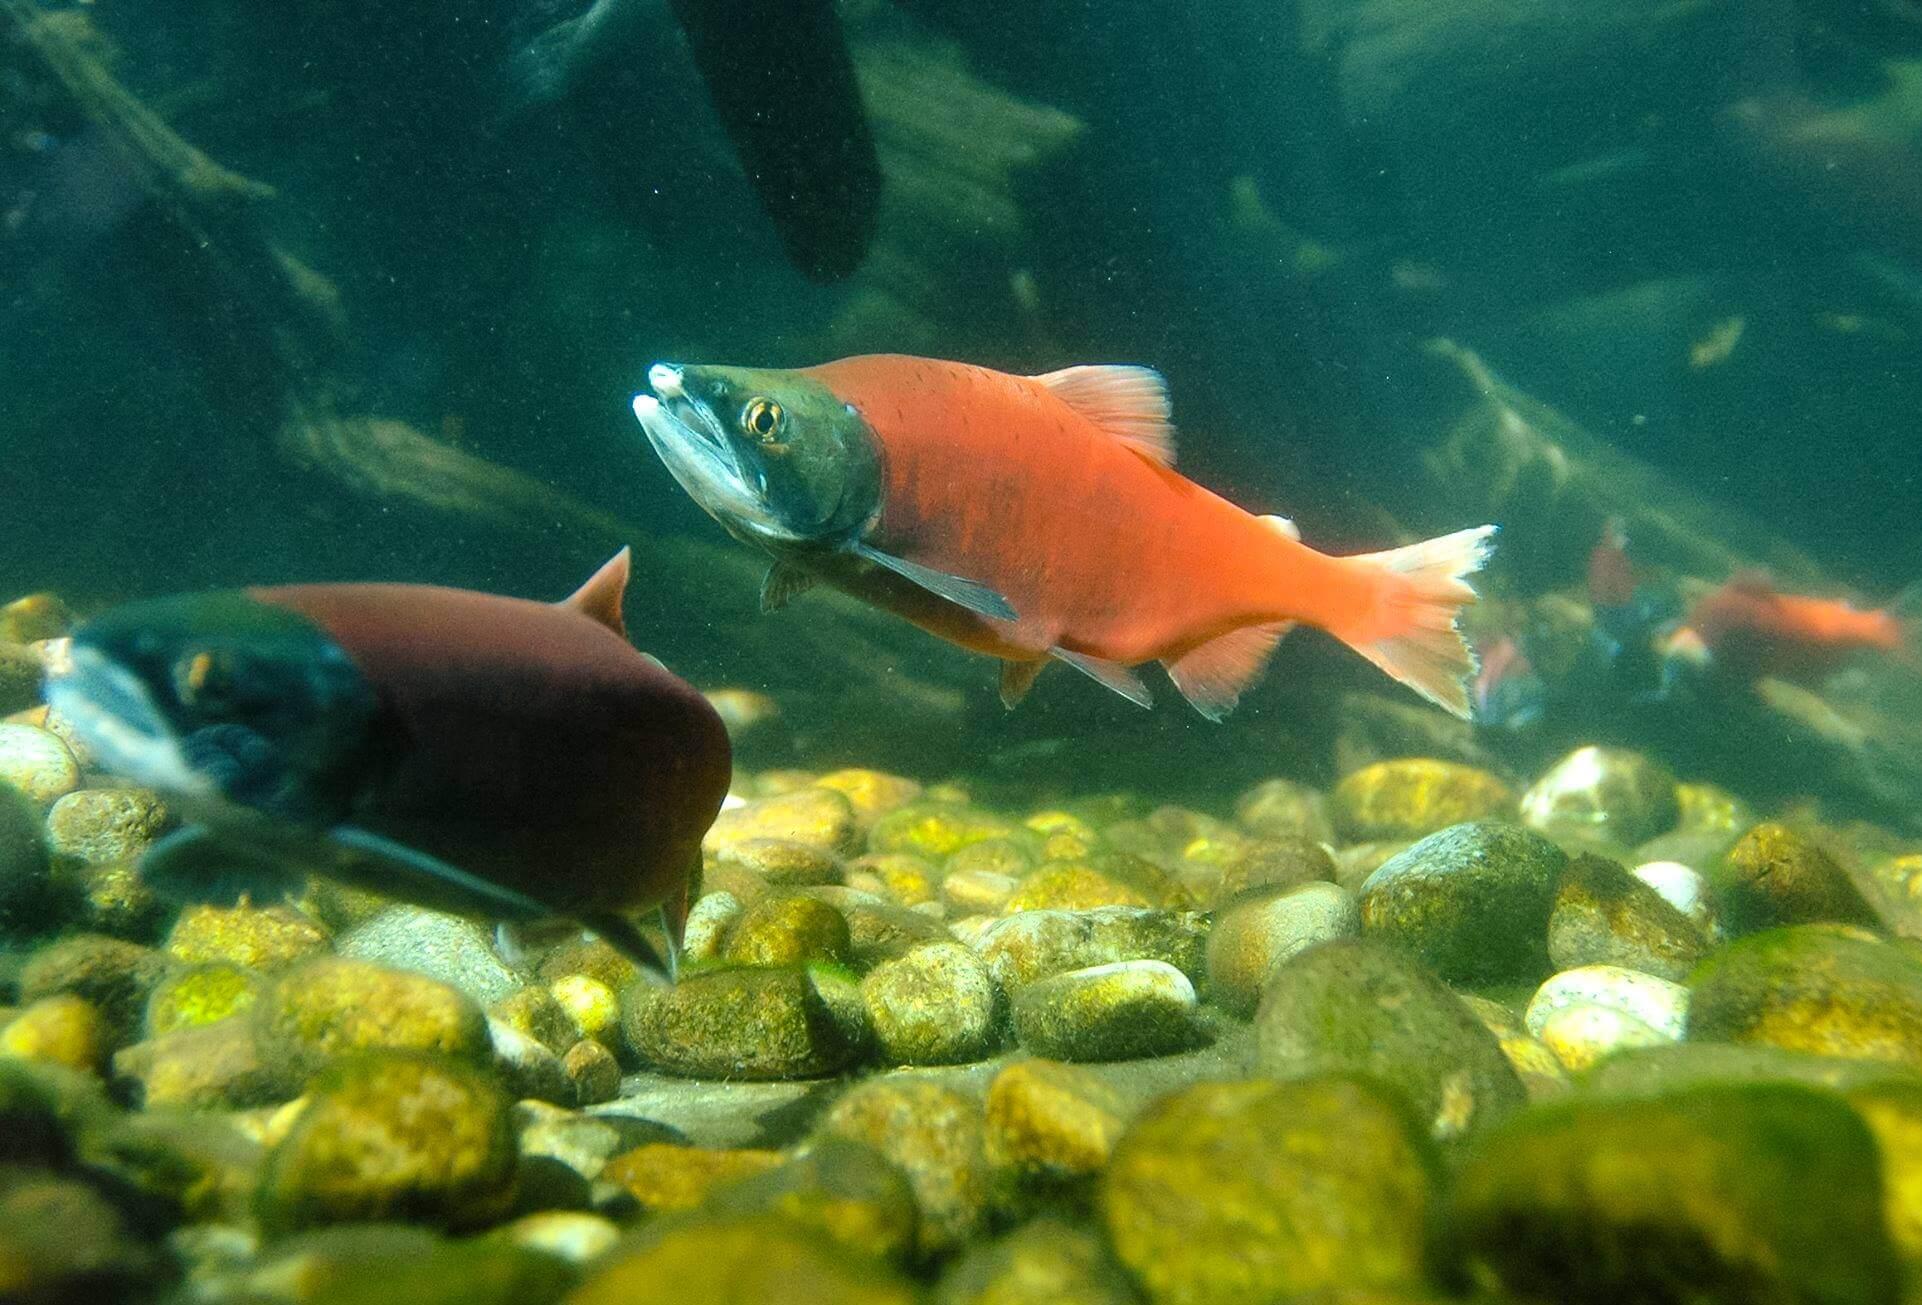 Freshwater aquarium fish boise idaho - Bright Red Kokanee Salmon